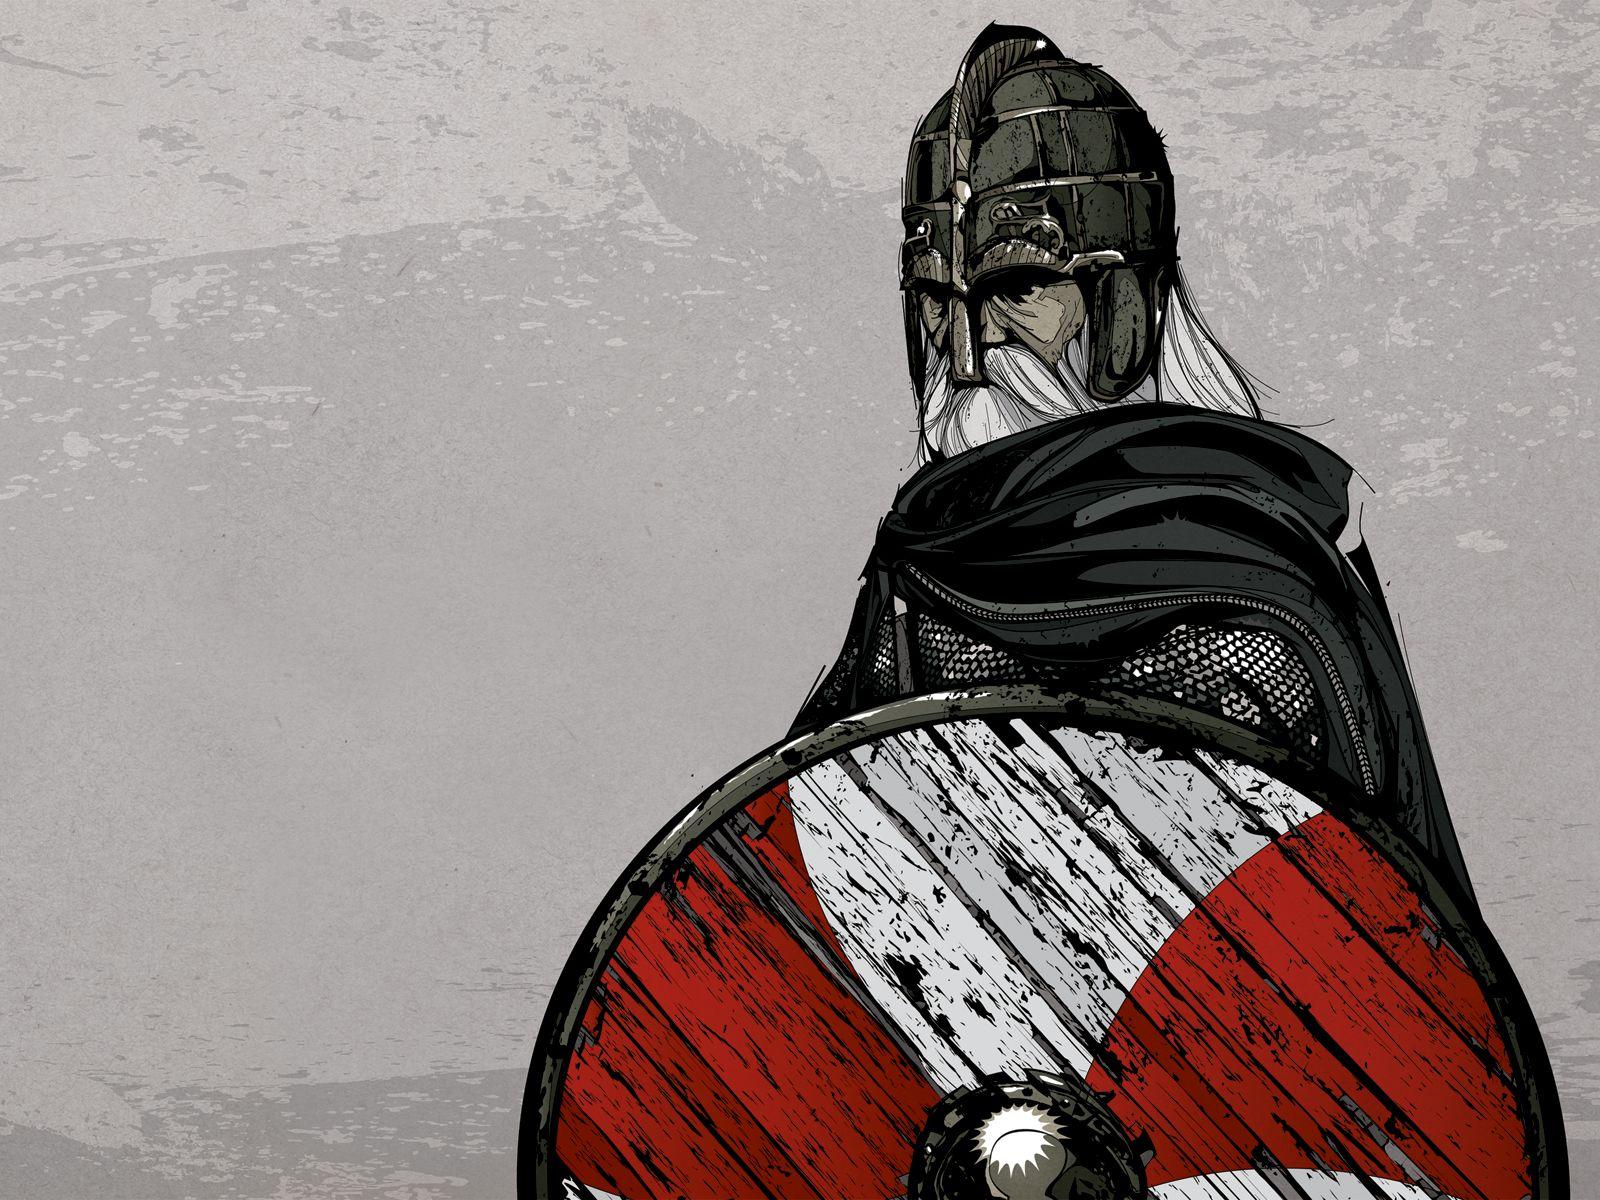 Resultado de imagem para Vikings art